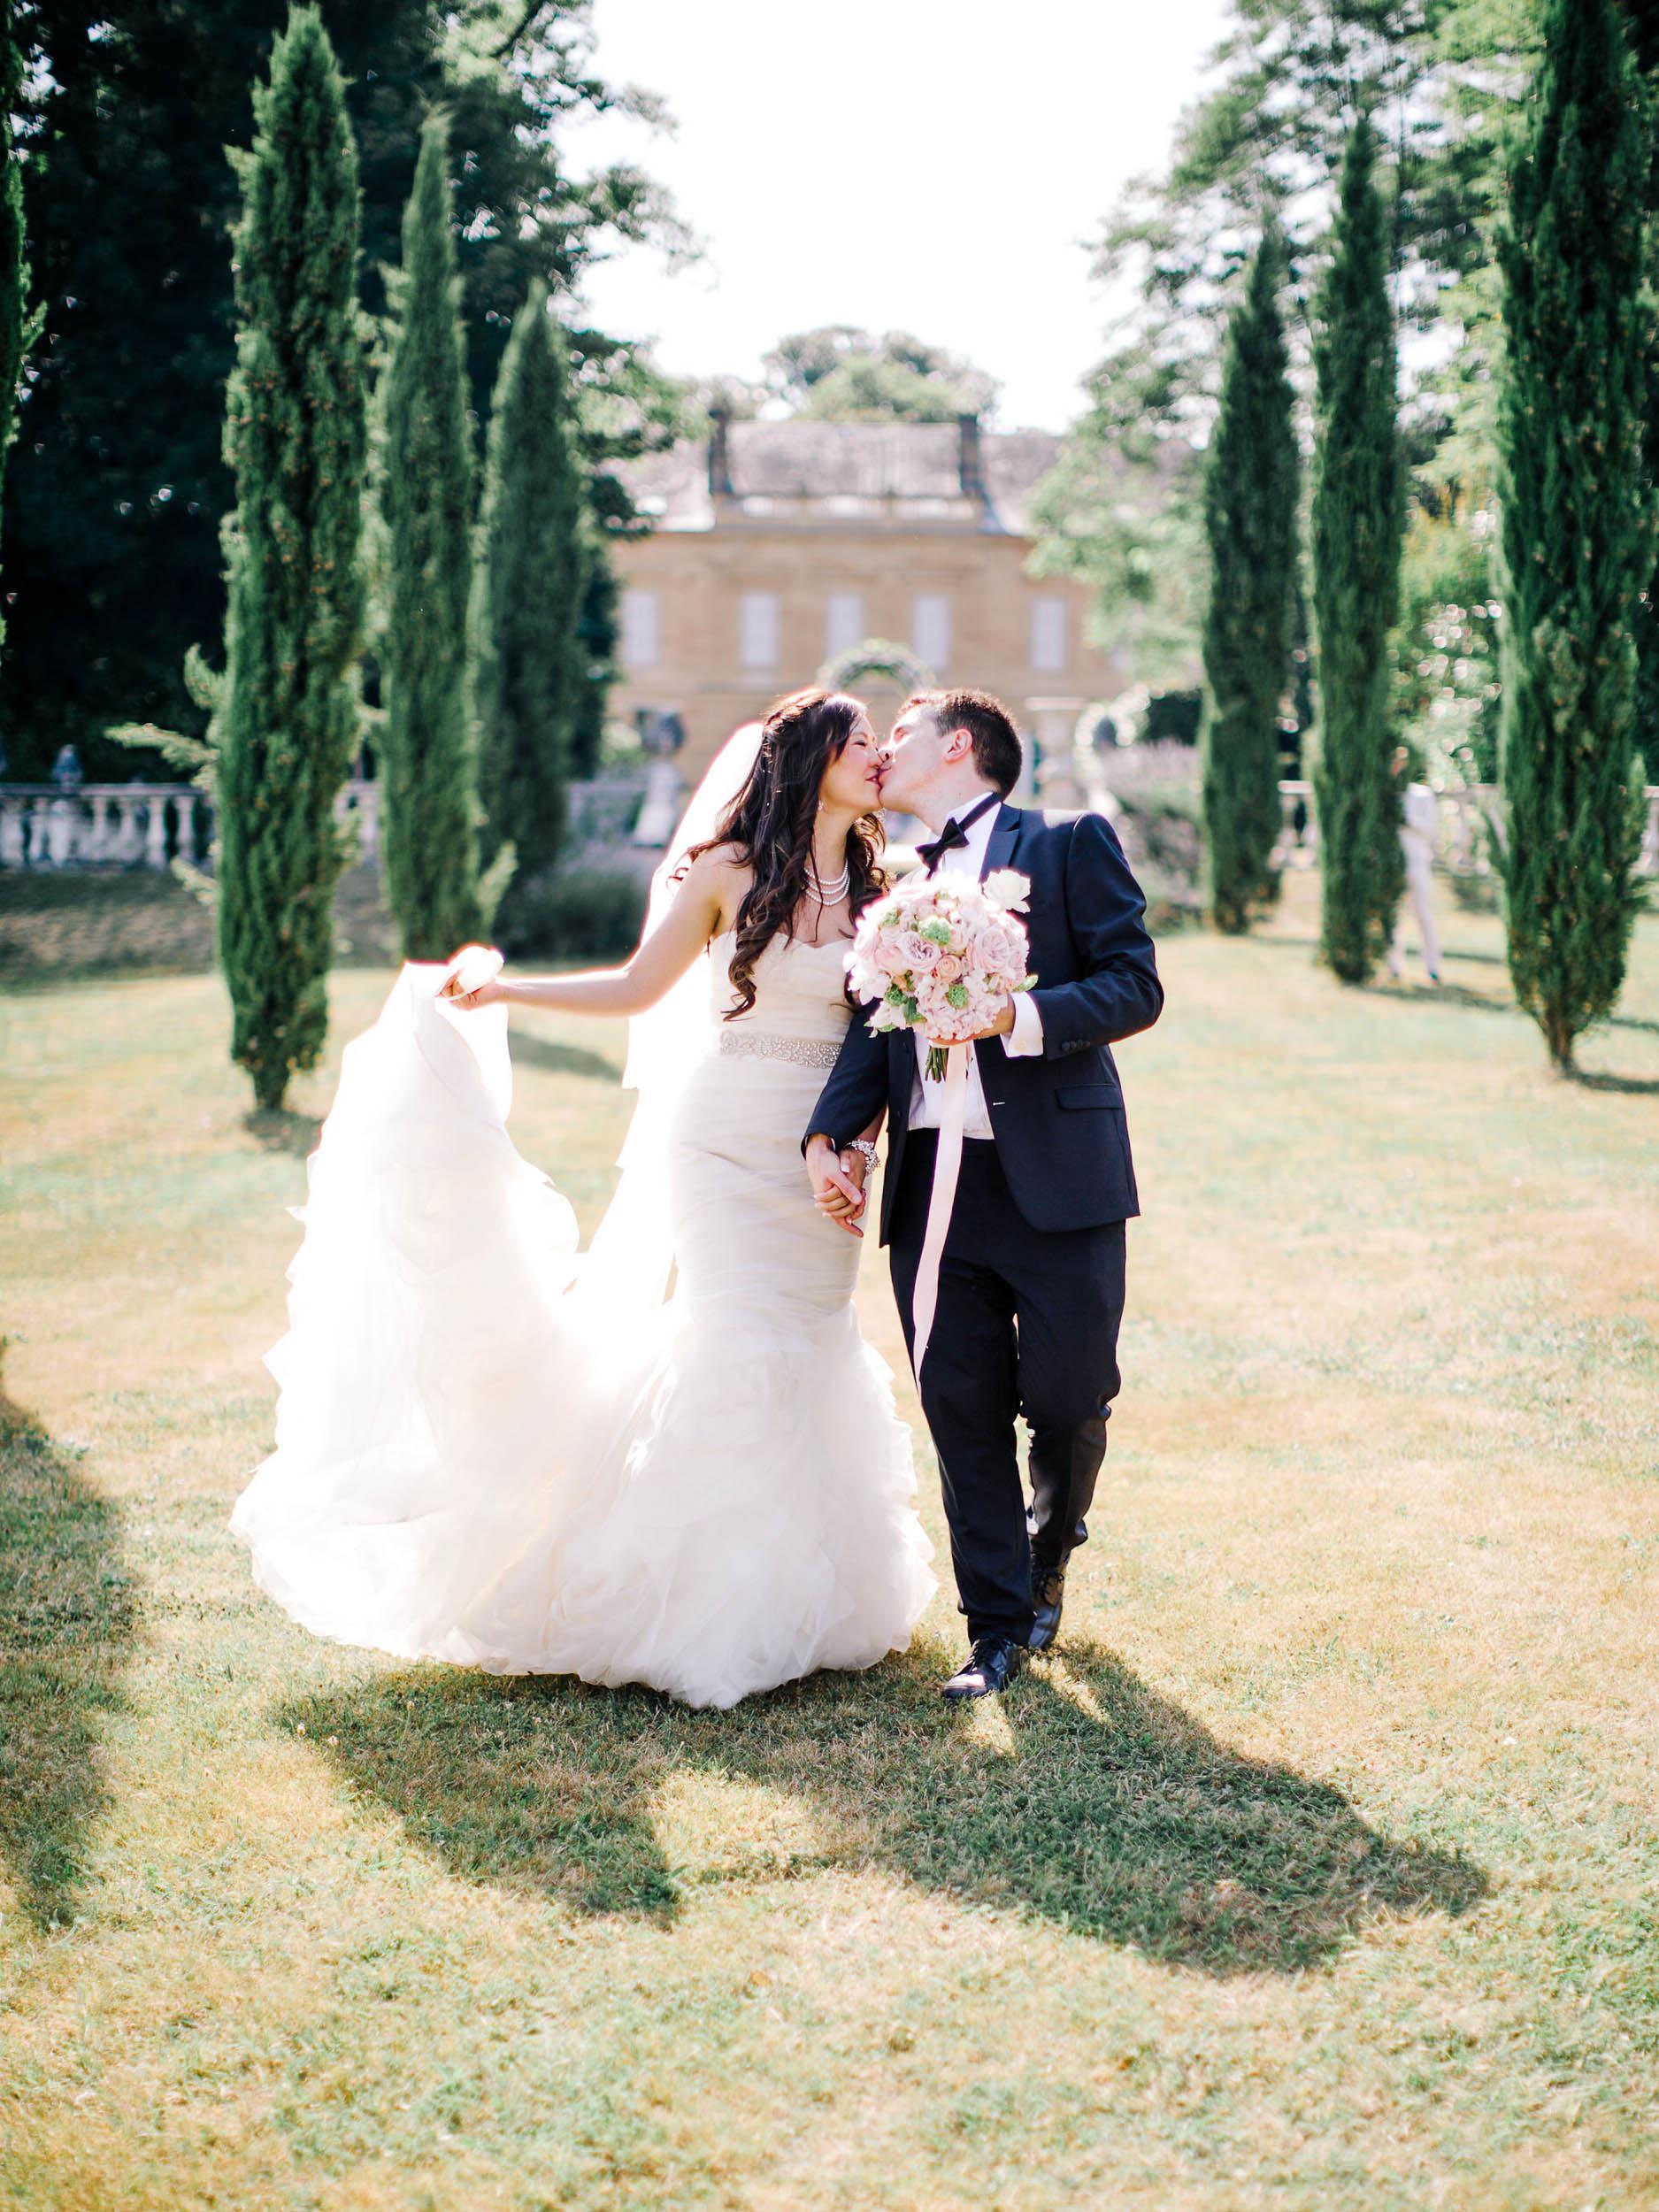 Amy O'Boyle Photography- Destination & UK Fine Art Film Wedding Photographer- Chateau La Durantie Wedding-32.jpg